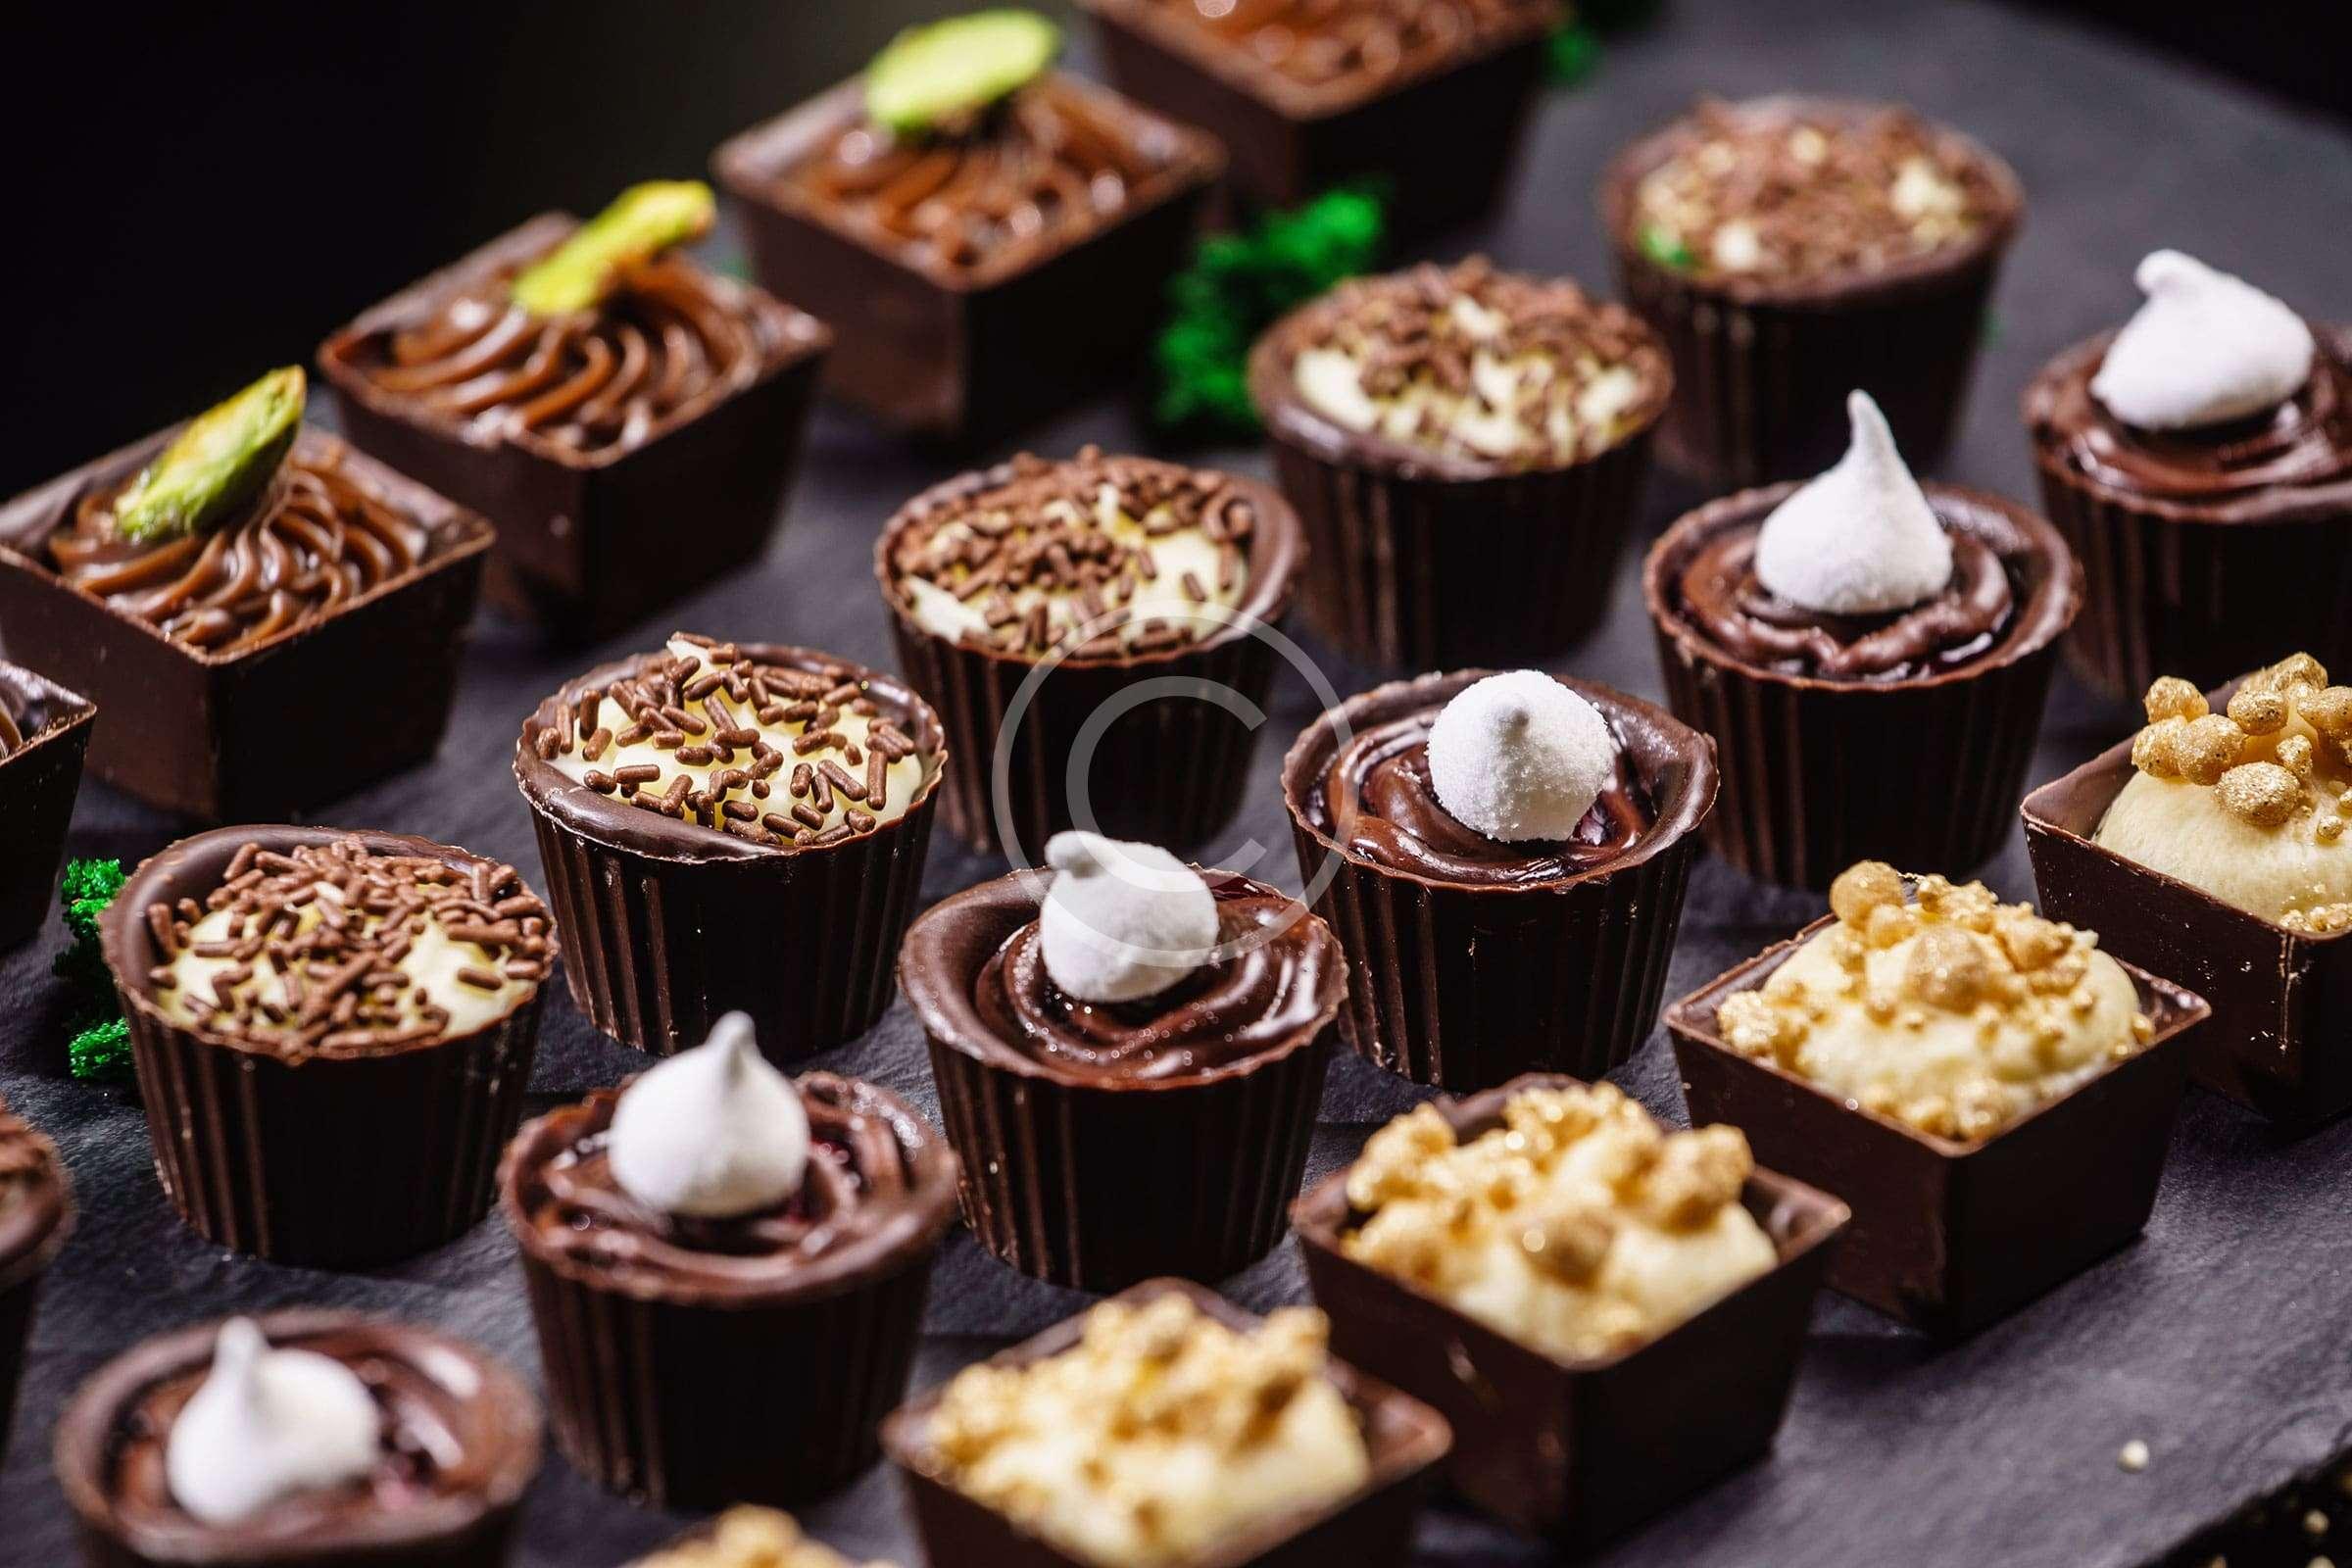 Healthy Chocolate: 9 Health Benefits of Chocolate